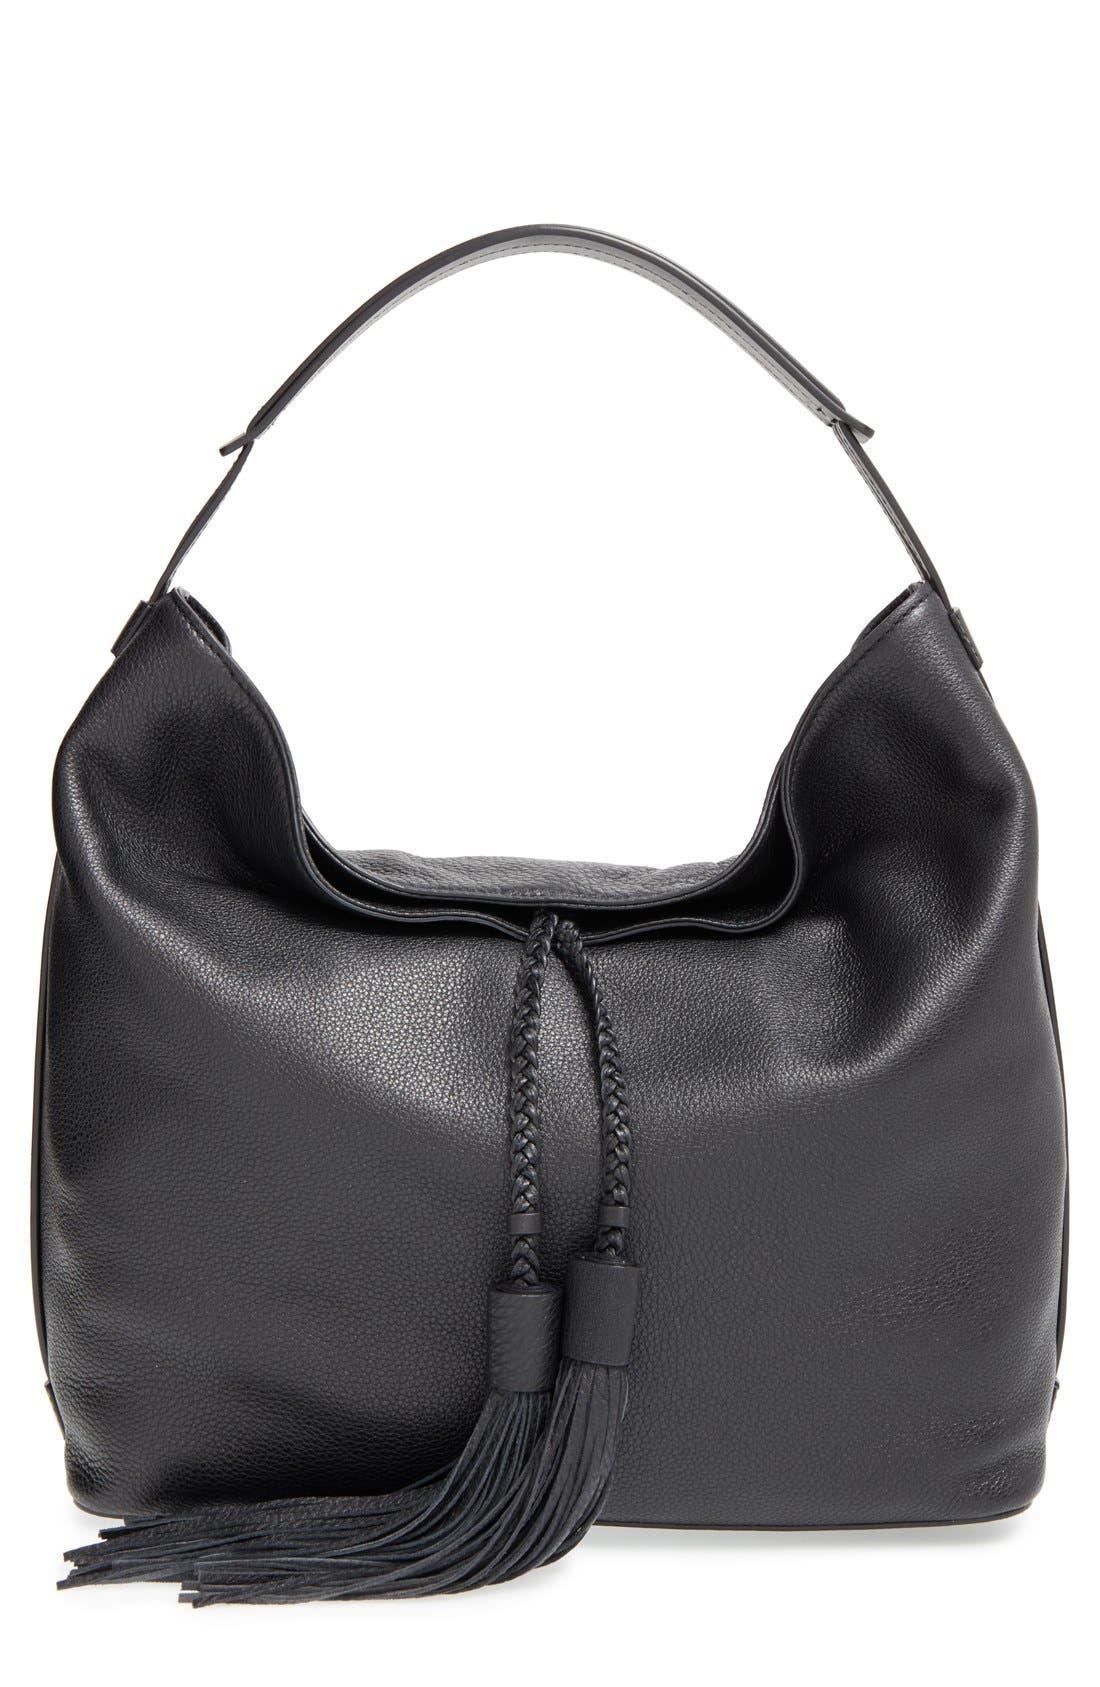 REBECCA MINKOFF, 'Isobel' Tassel Leather Hobo, Main thumbnail 1, color, 001